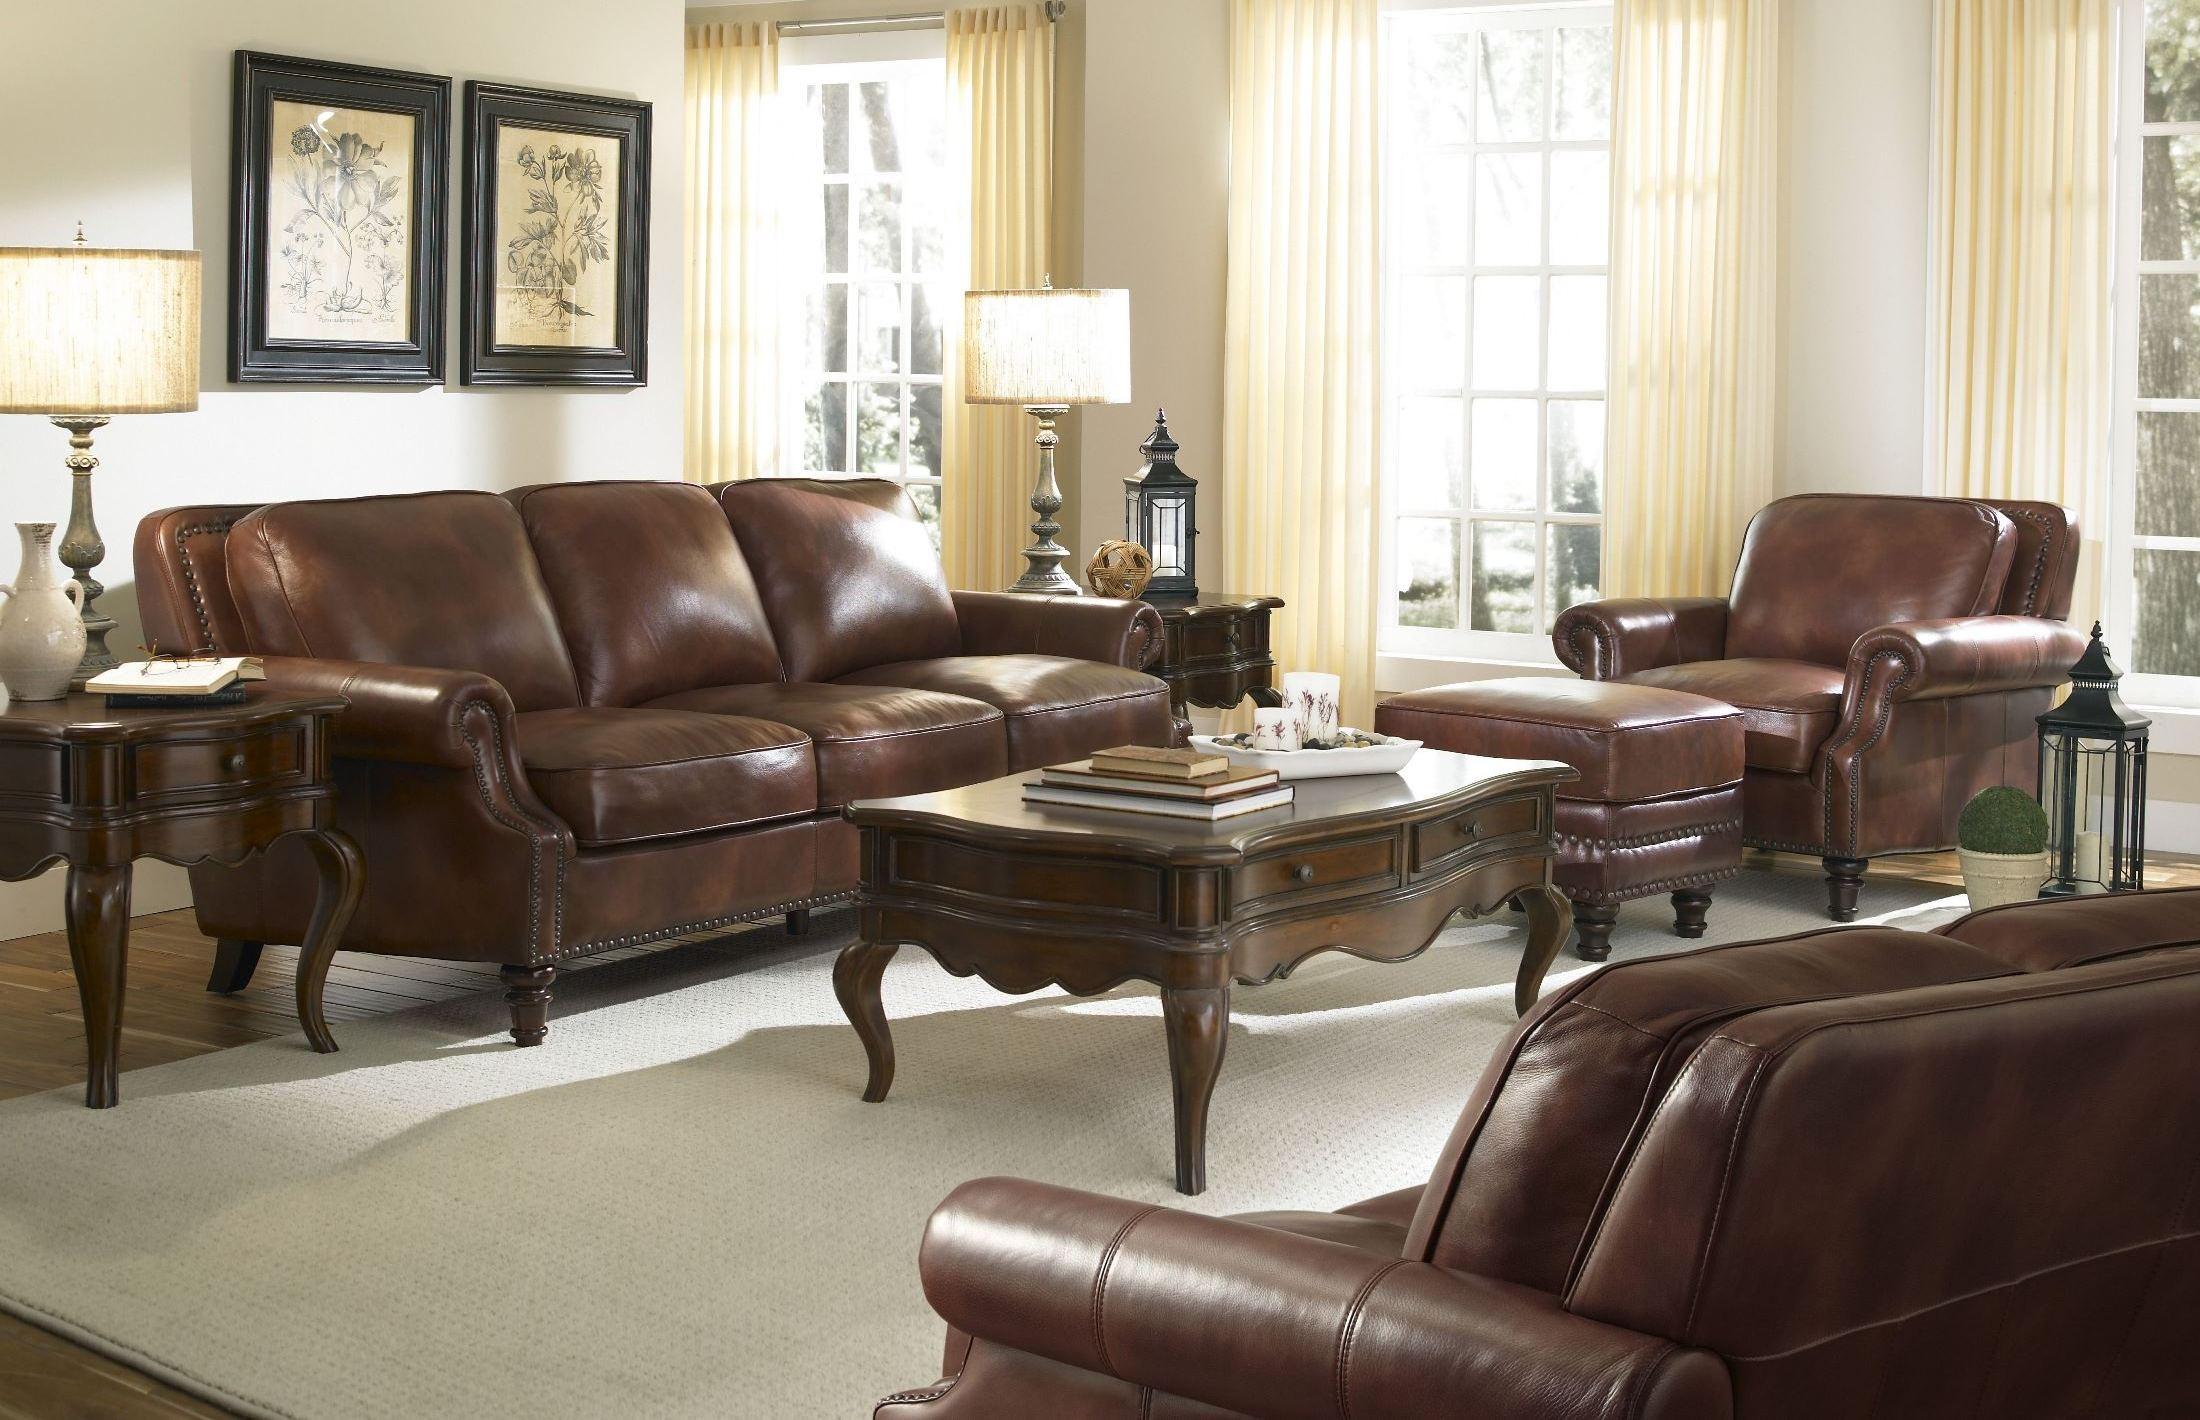 bentley leather sofa reviews sleeper recliner loveseat rustic savauge living room set from